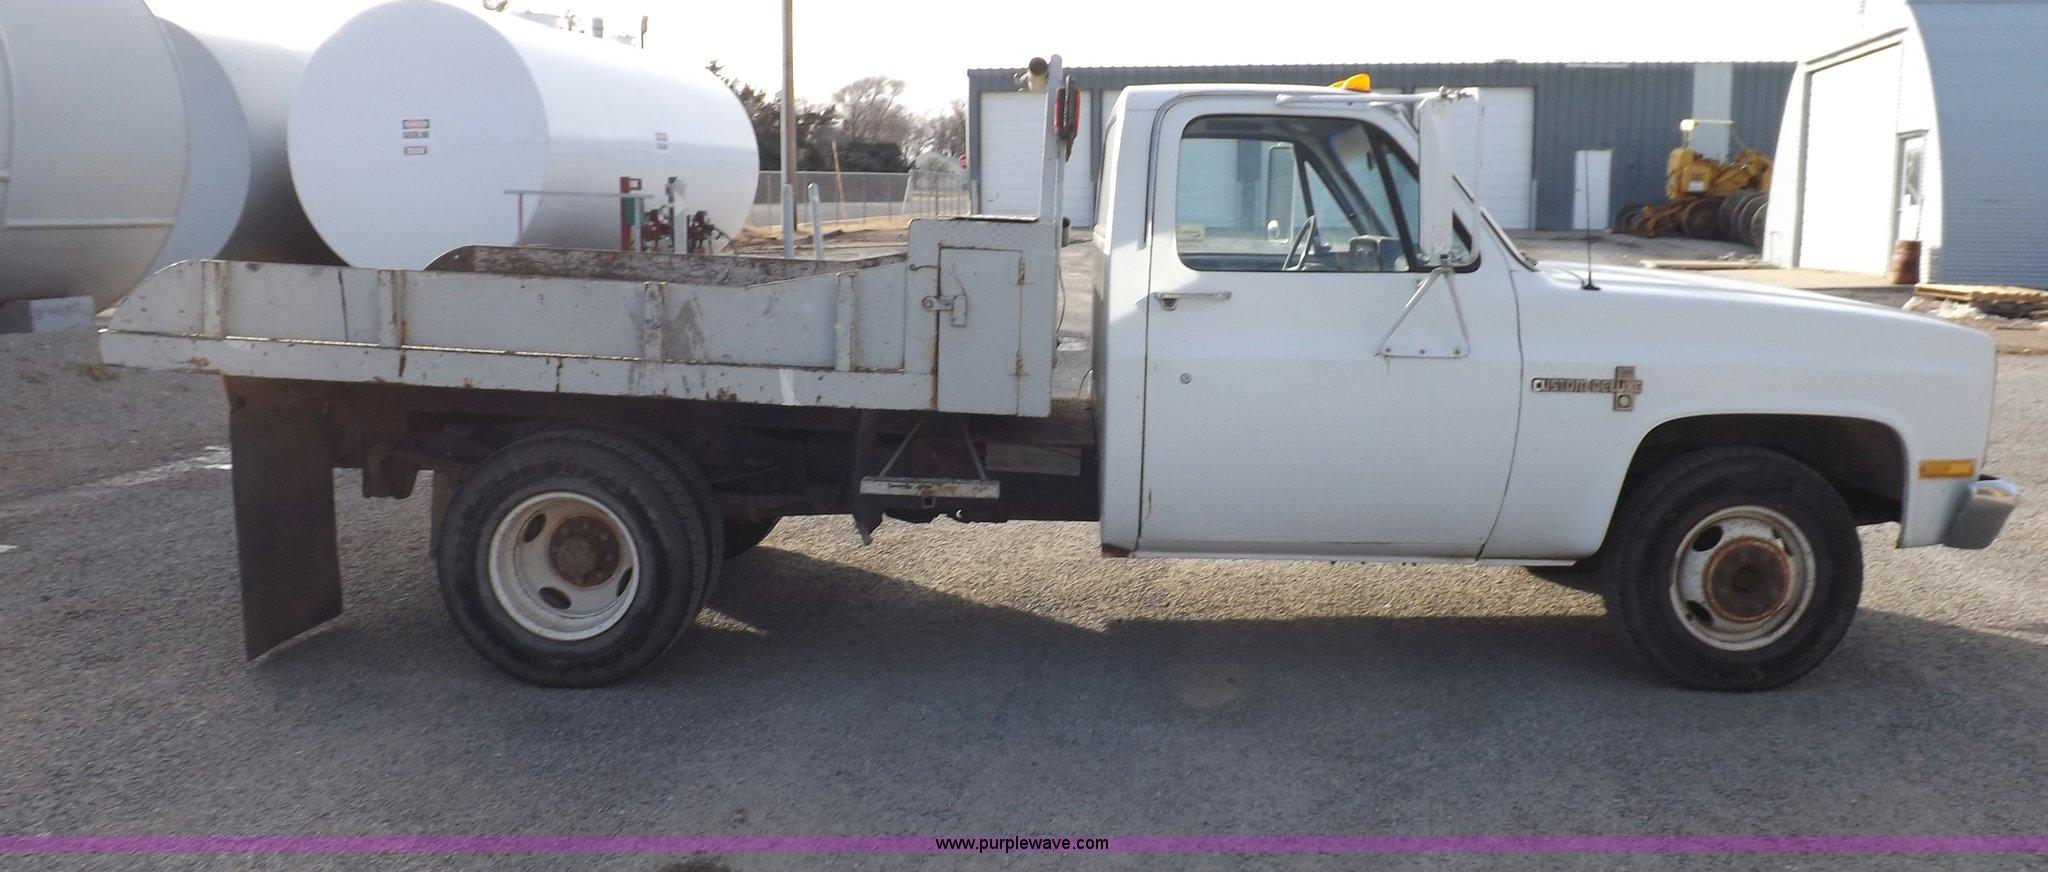 1988 chevrolet custom deluxe r30 flatbed truck full size in new window